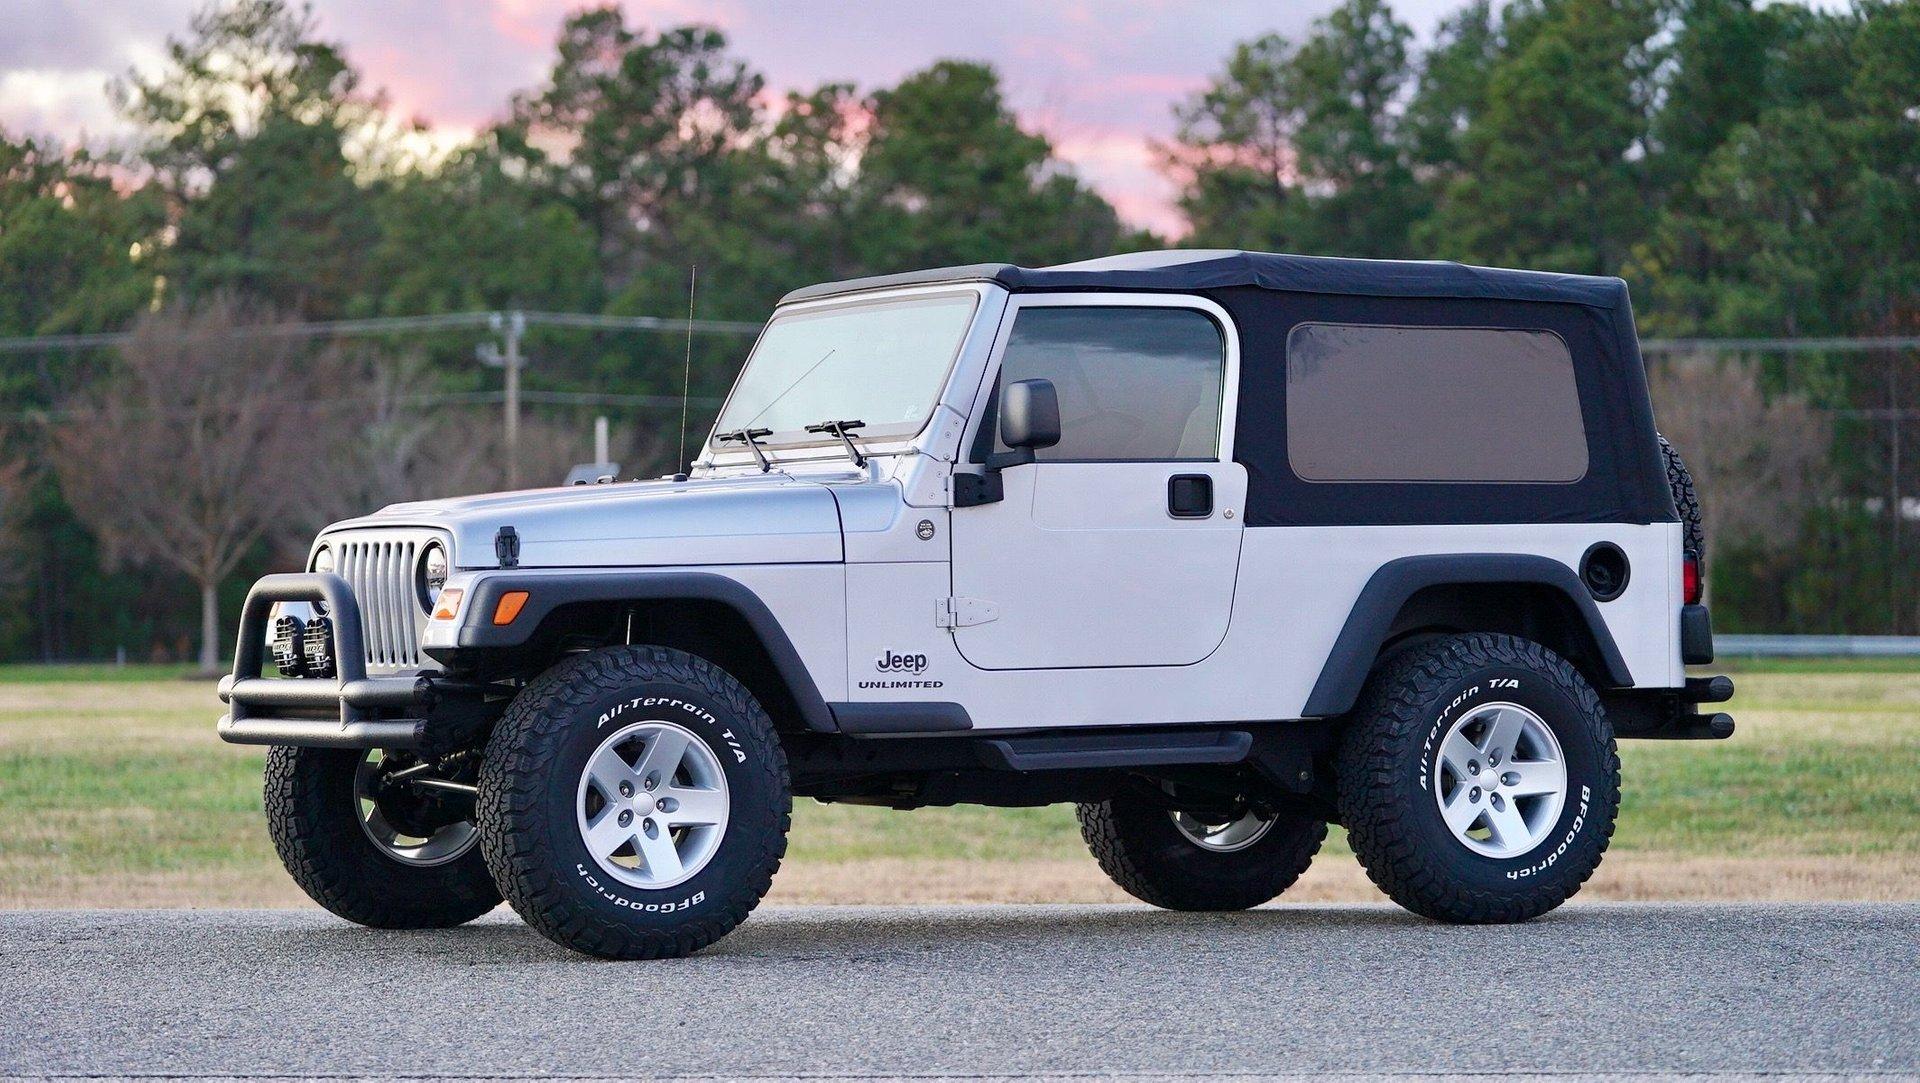 2005 jeep wrangler unlimited lj